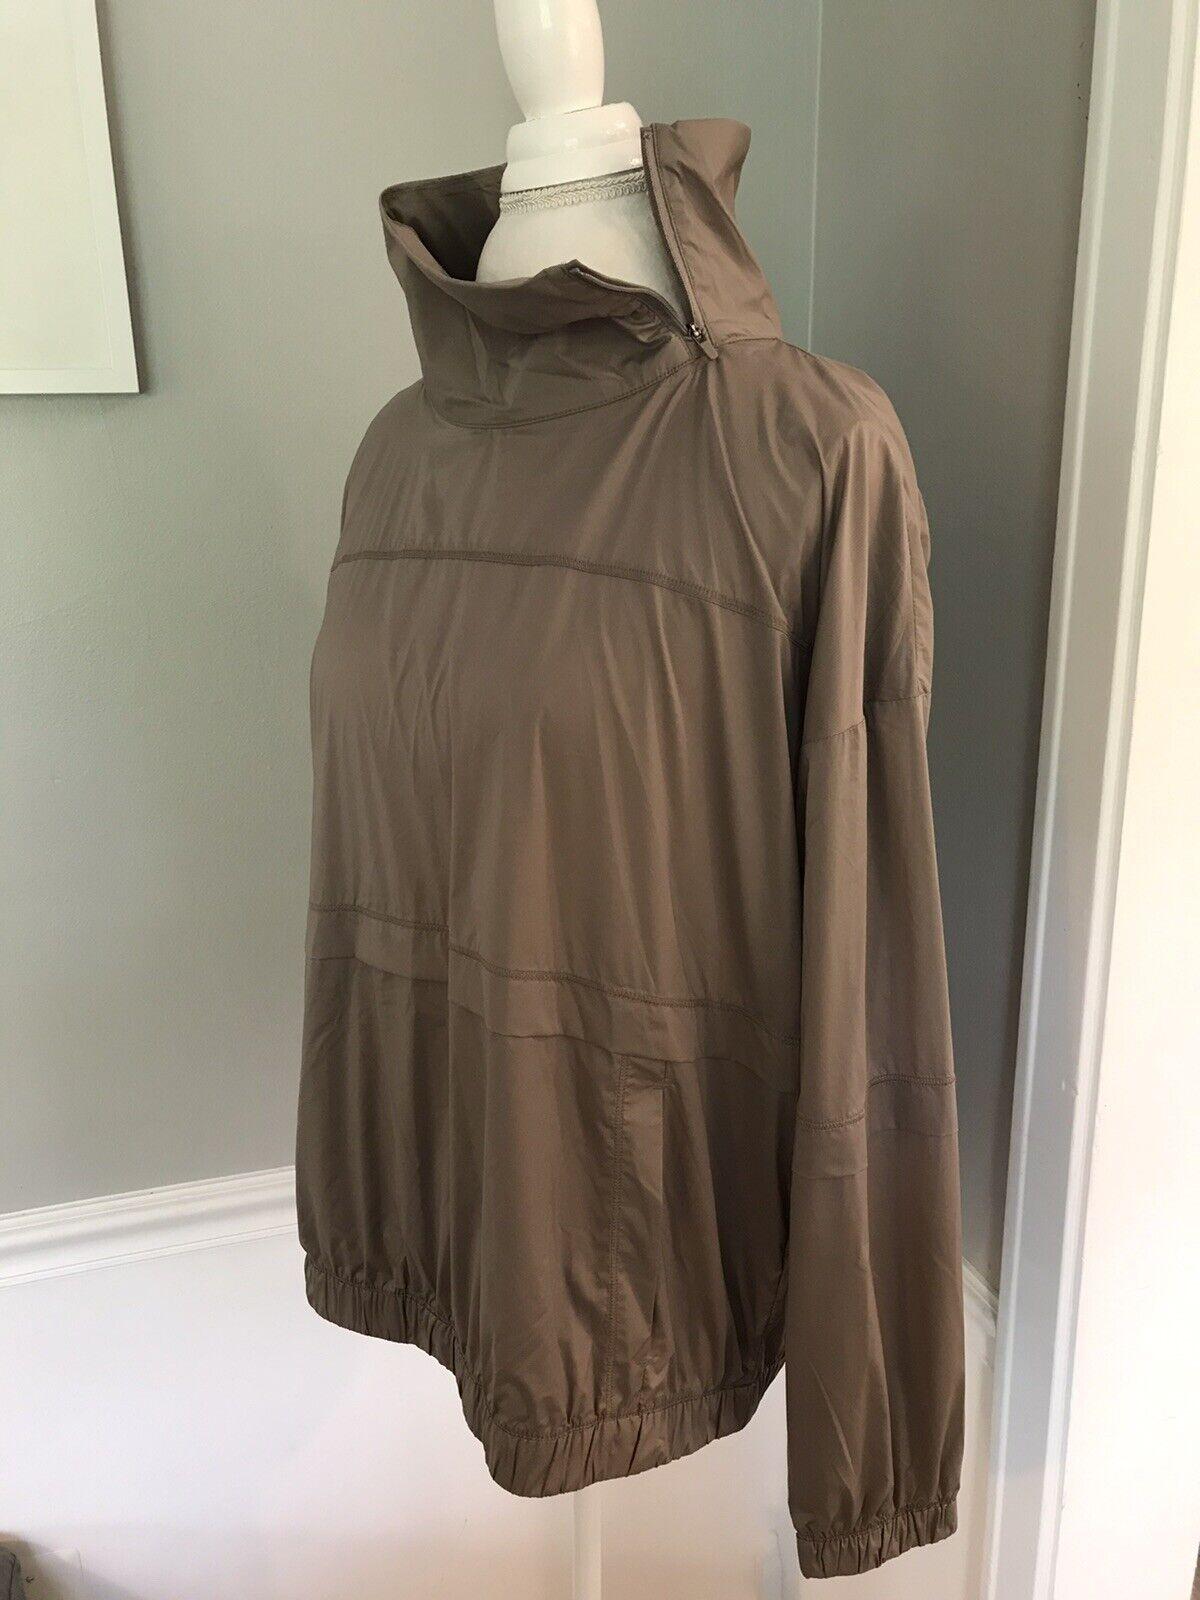 NWT ATHLETA Run With It Half Zip Pullover Jacket MEDIUM Mortar Mushroom Top